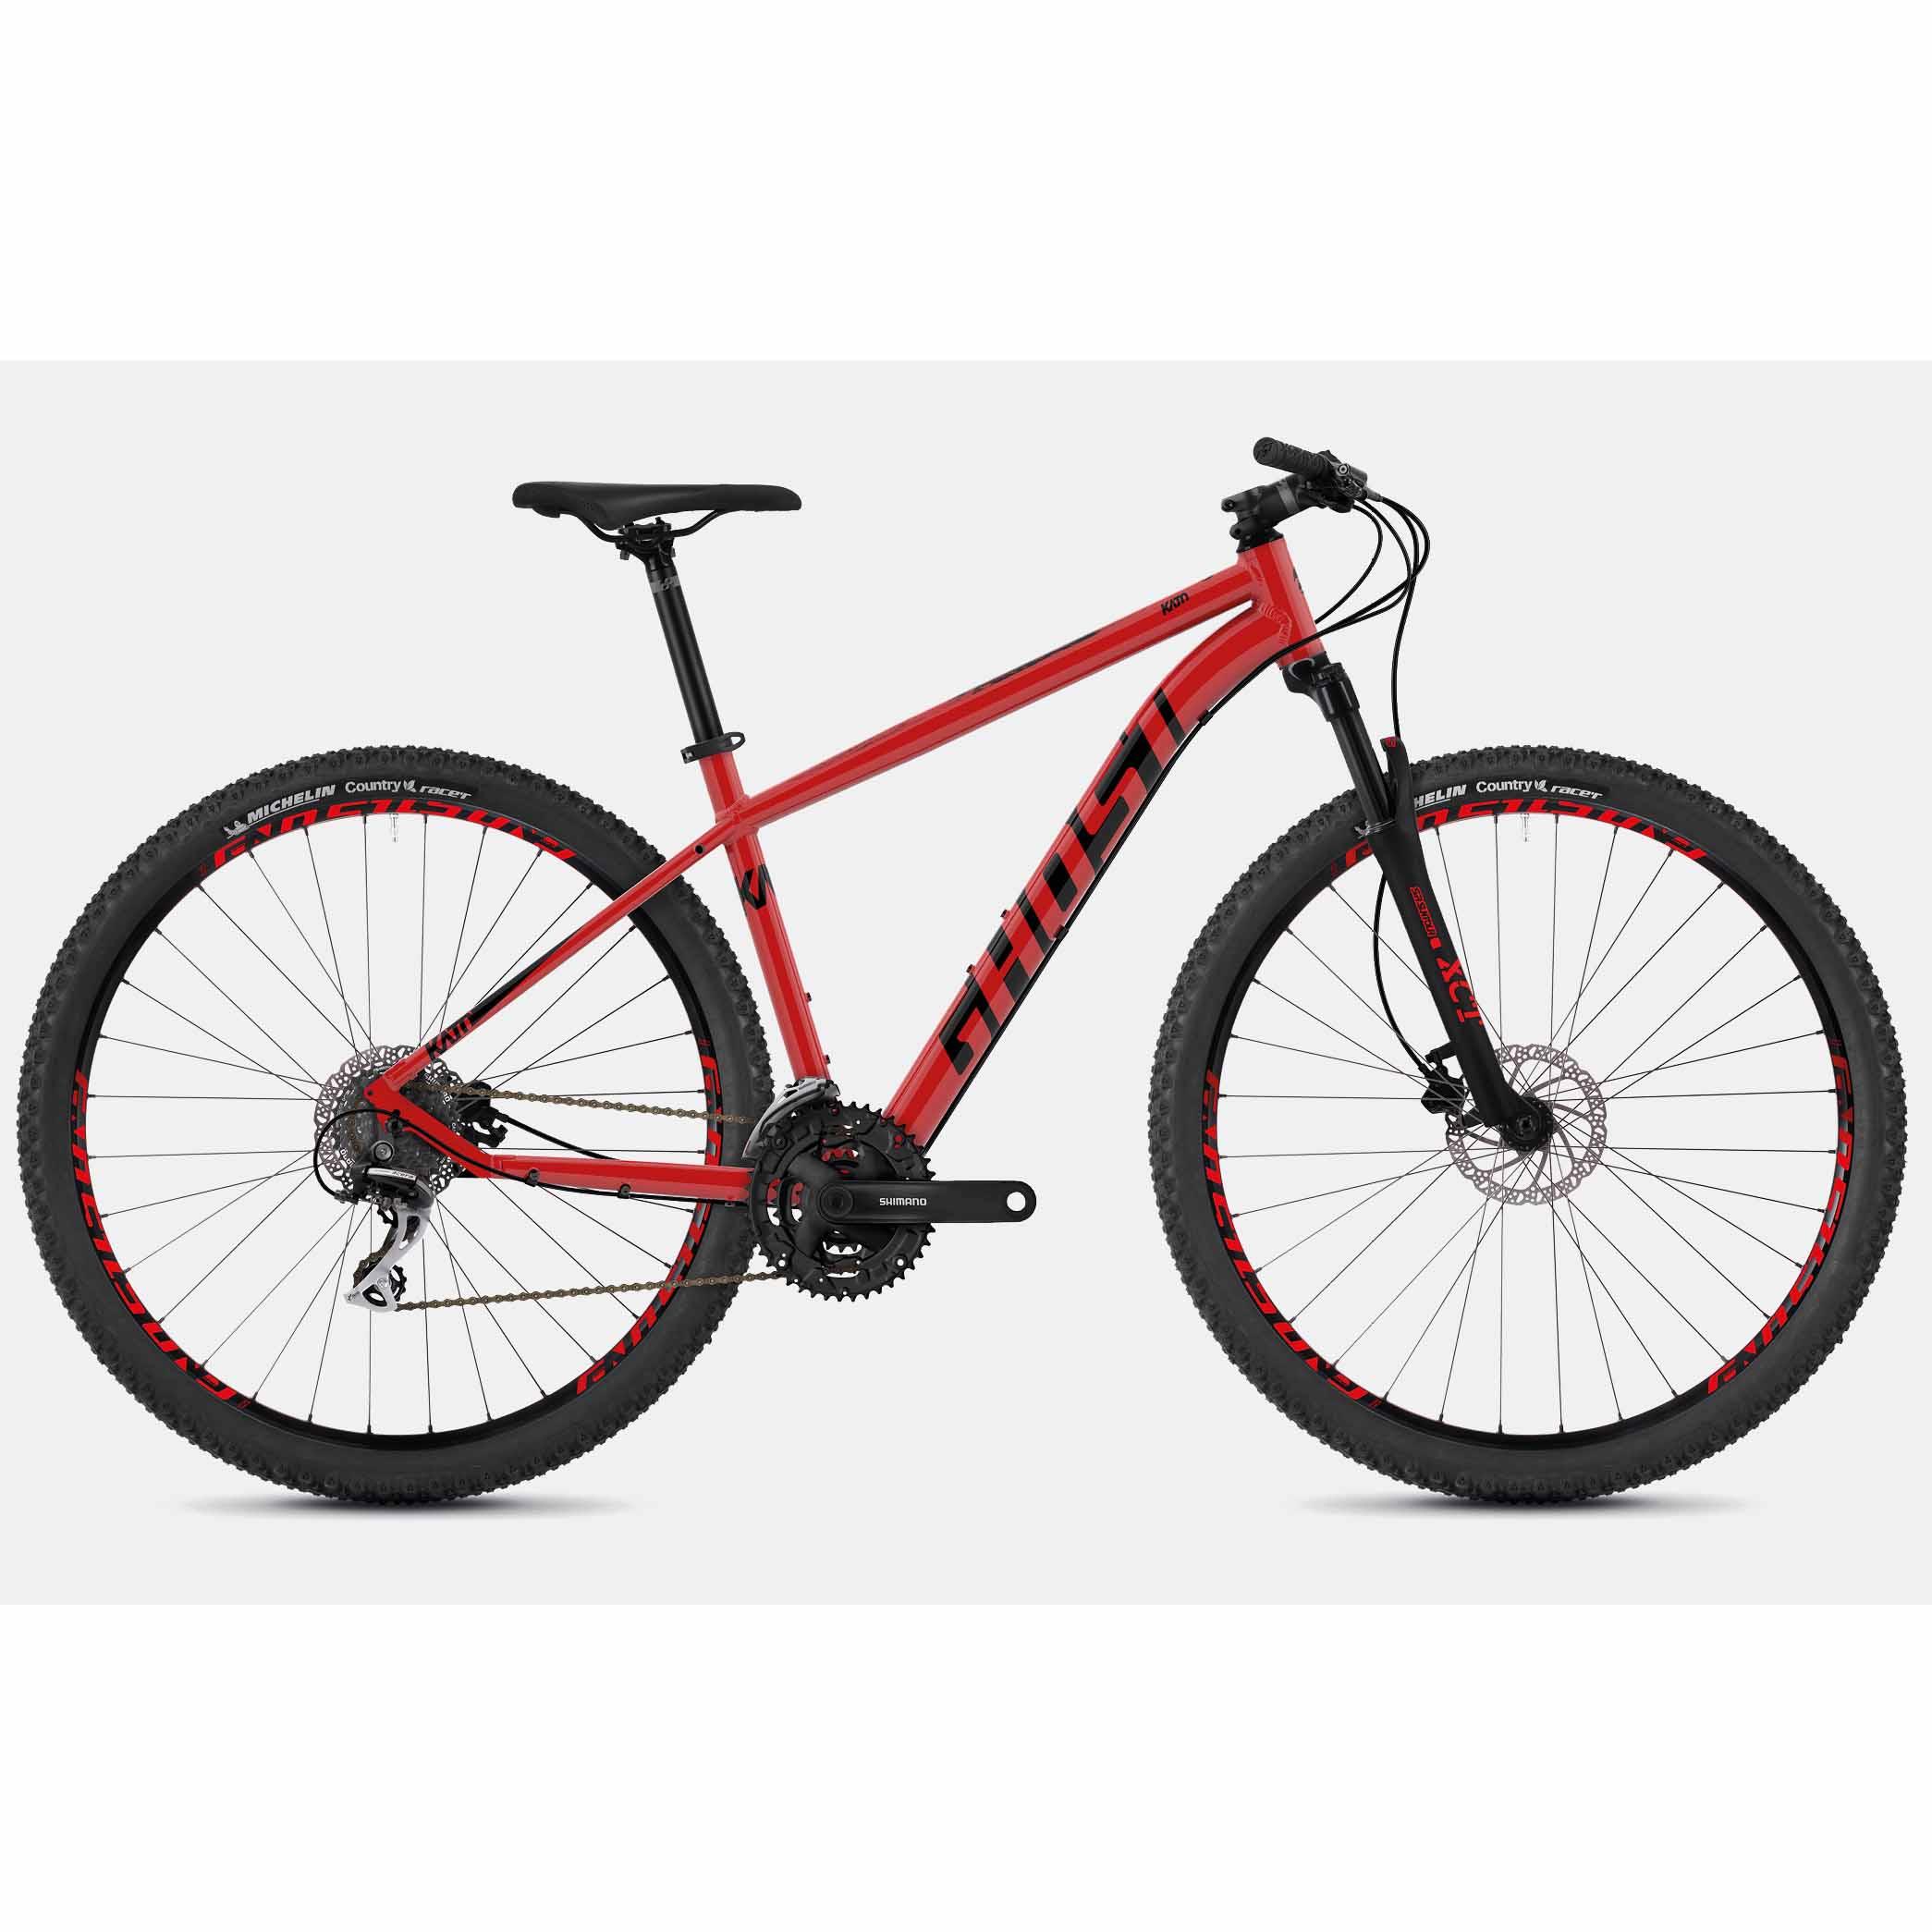 Фото Велосипед Ghost Kato 2.9 29″ , рама  L,красно-черный,  2019